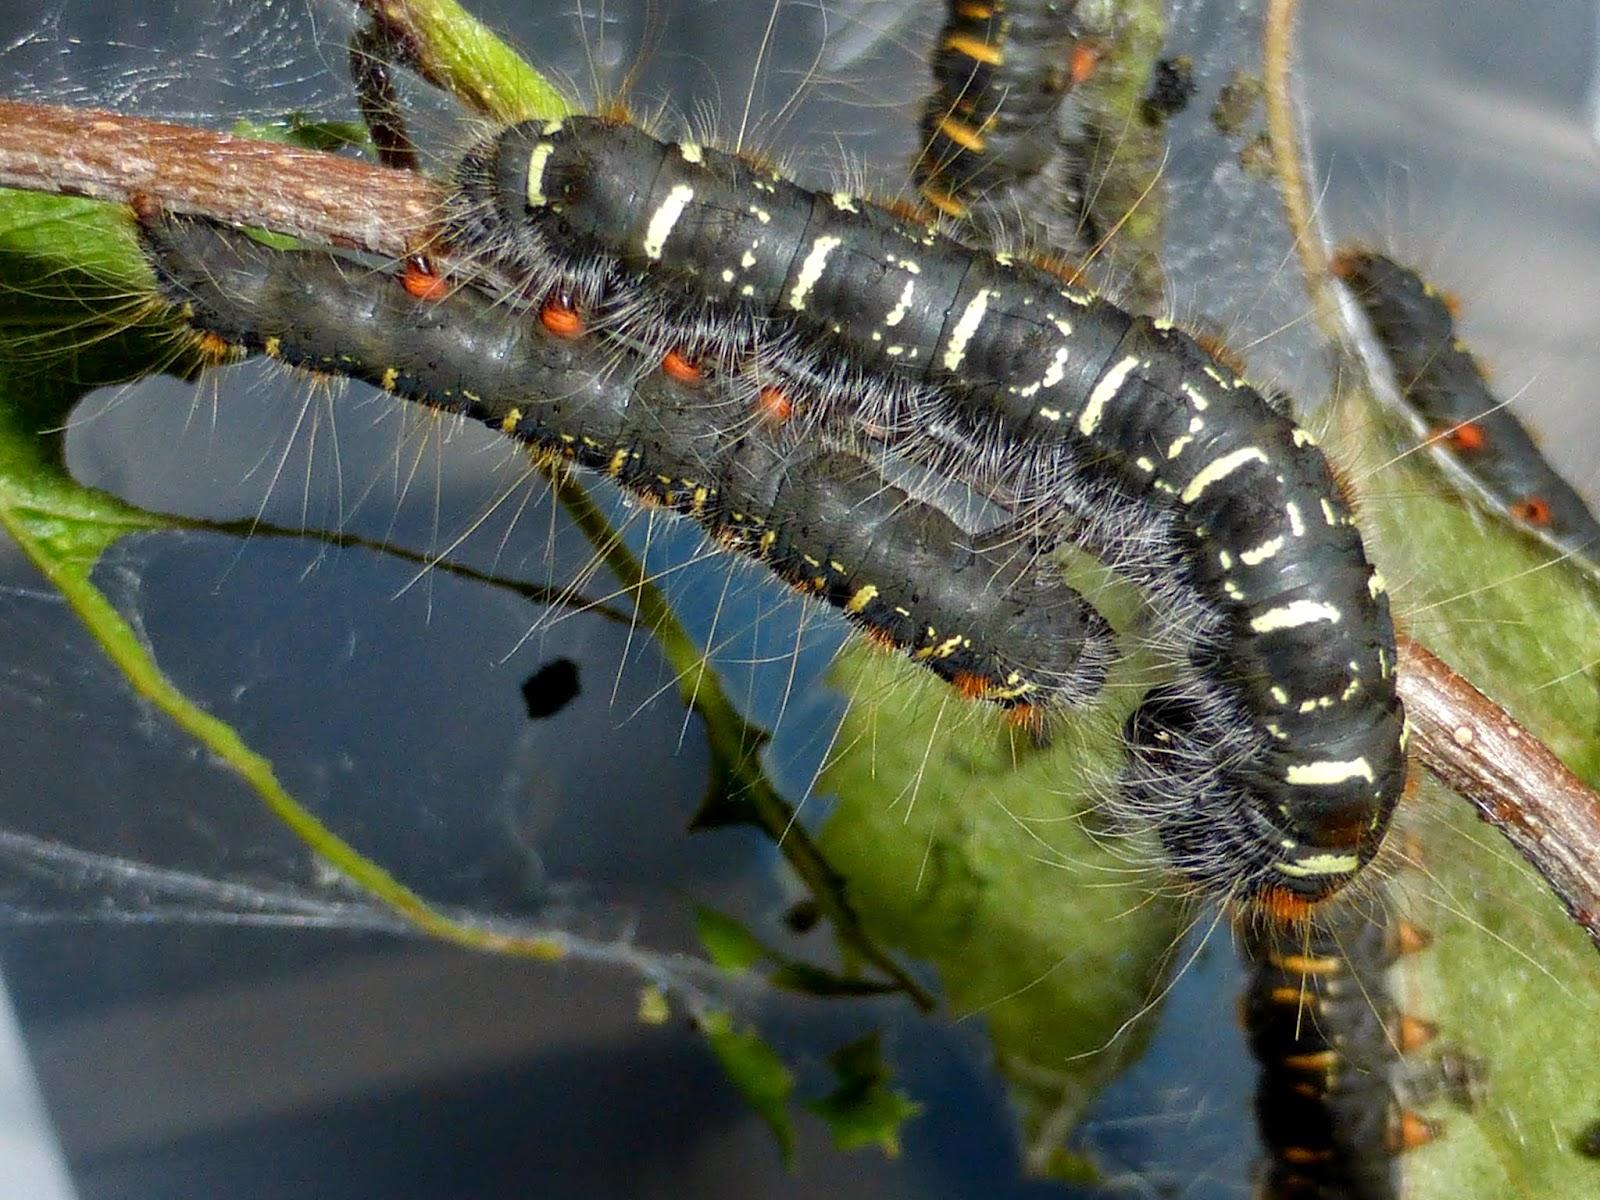 Eriogaster lanestris L4 caterpillars